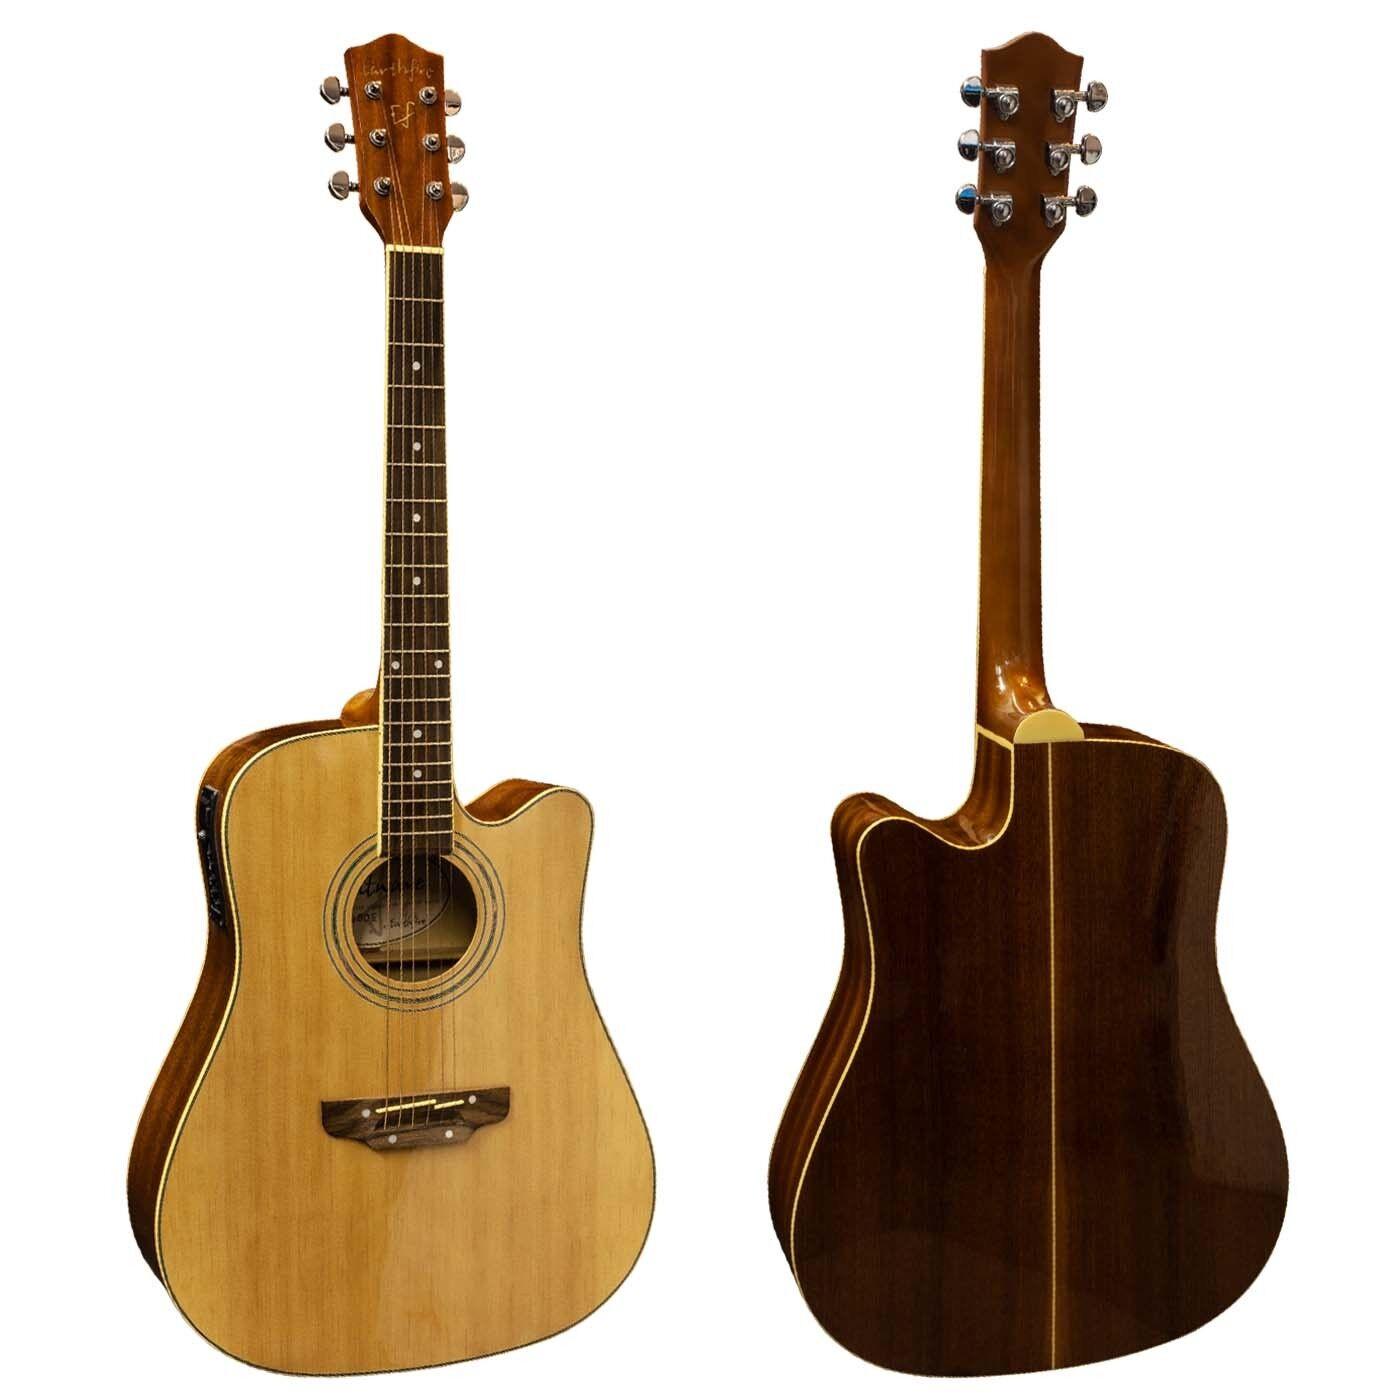 Earthfire Dreadnought Electro Guitarra Acústica Cuerdas Cuerdas Cuerdas De Acero Cutaway GA3090E C  sin mínimo